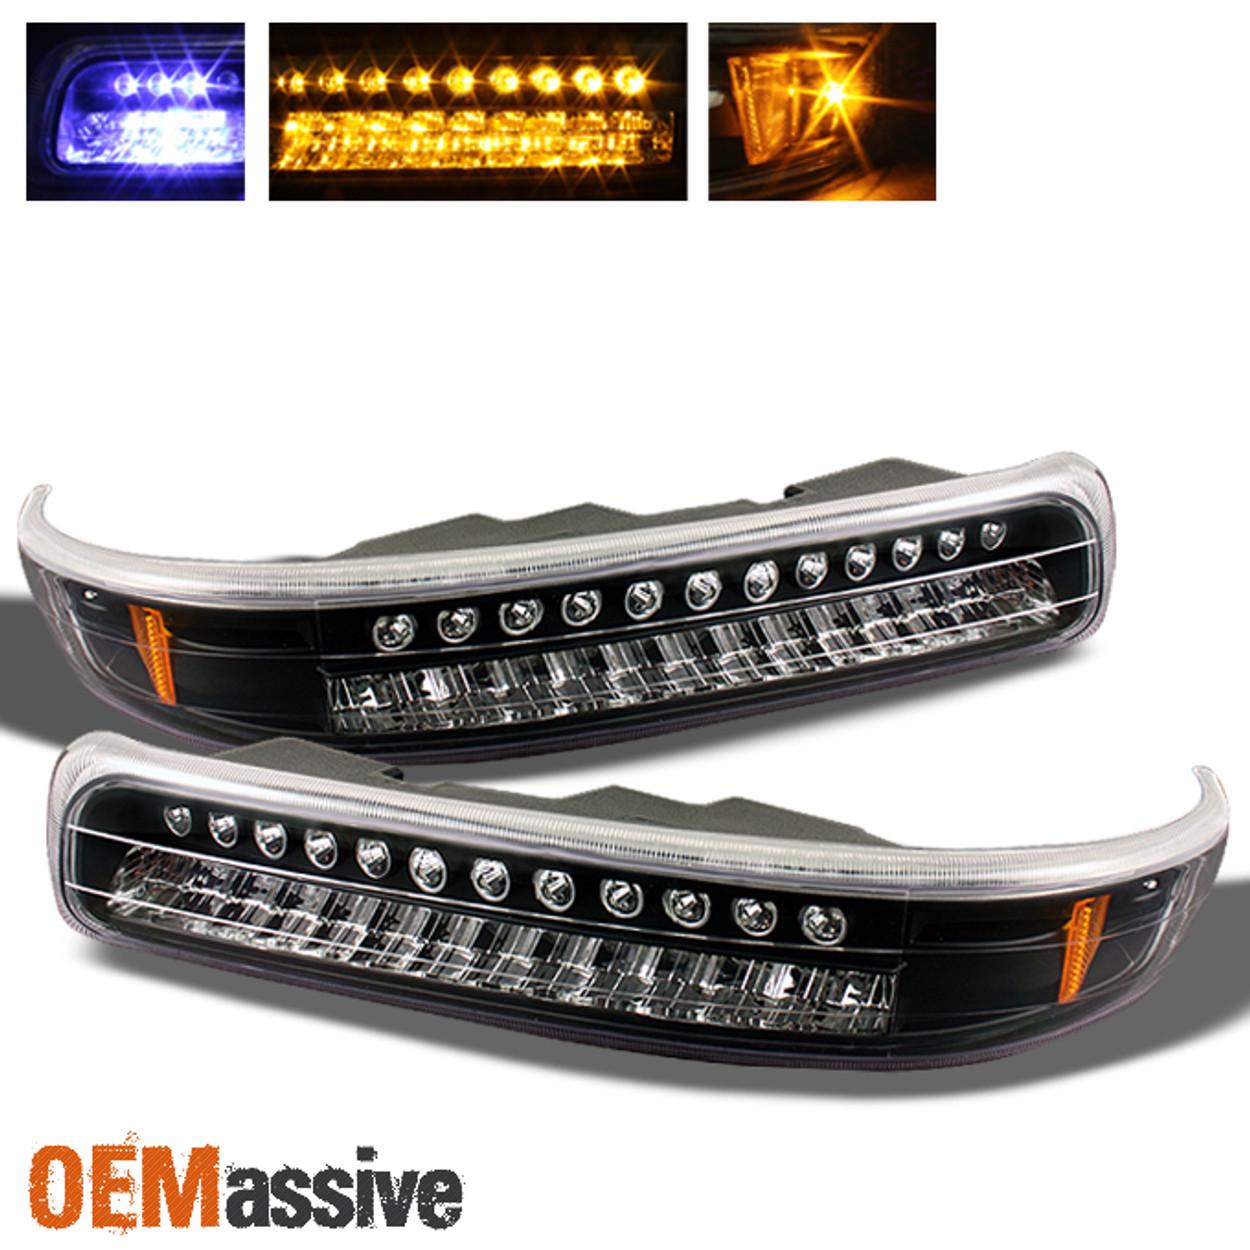 LED Bumper Signal Lights Fits 99-02 Silverado 00-06 Tahoe Suburban Headlights